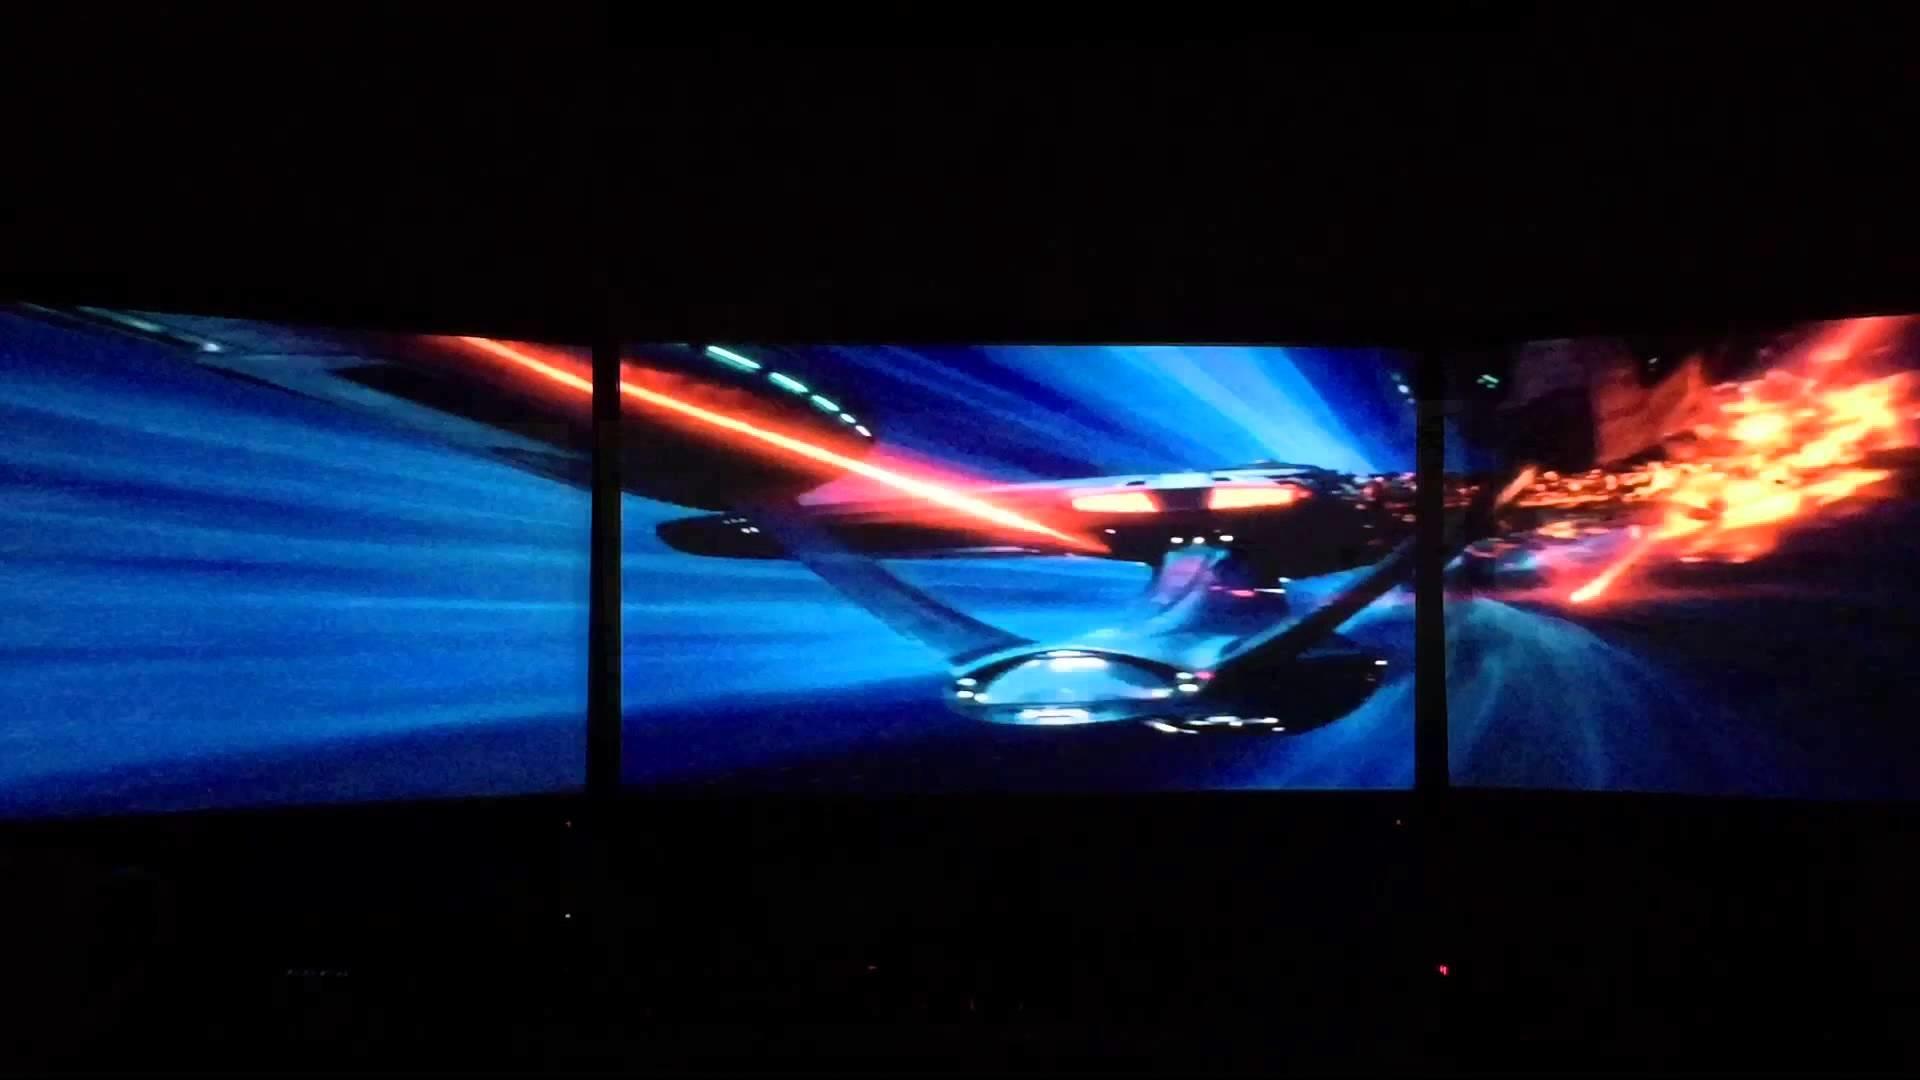 star trek movie clips eyefinity surround triple monitors